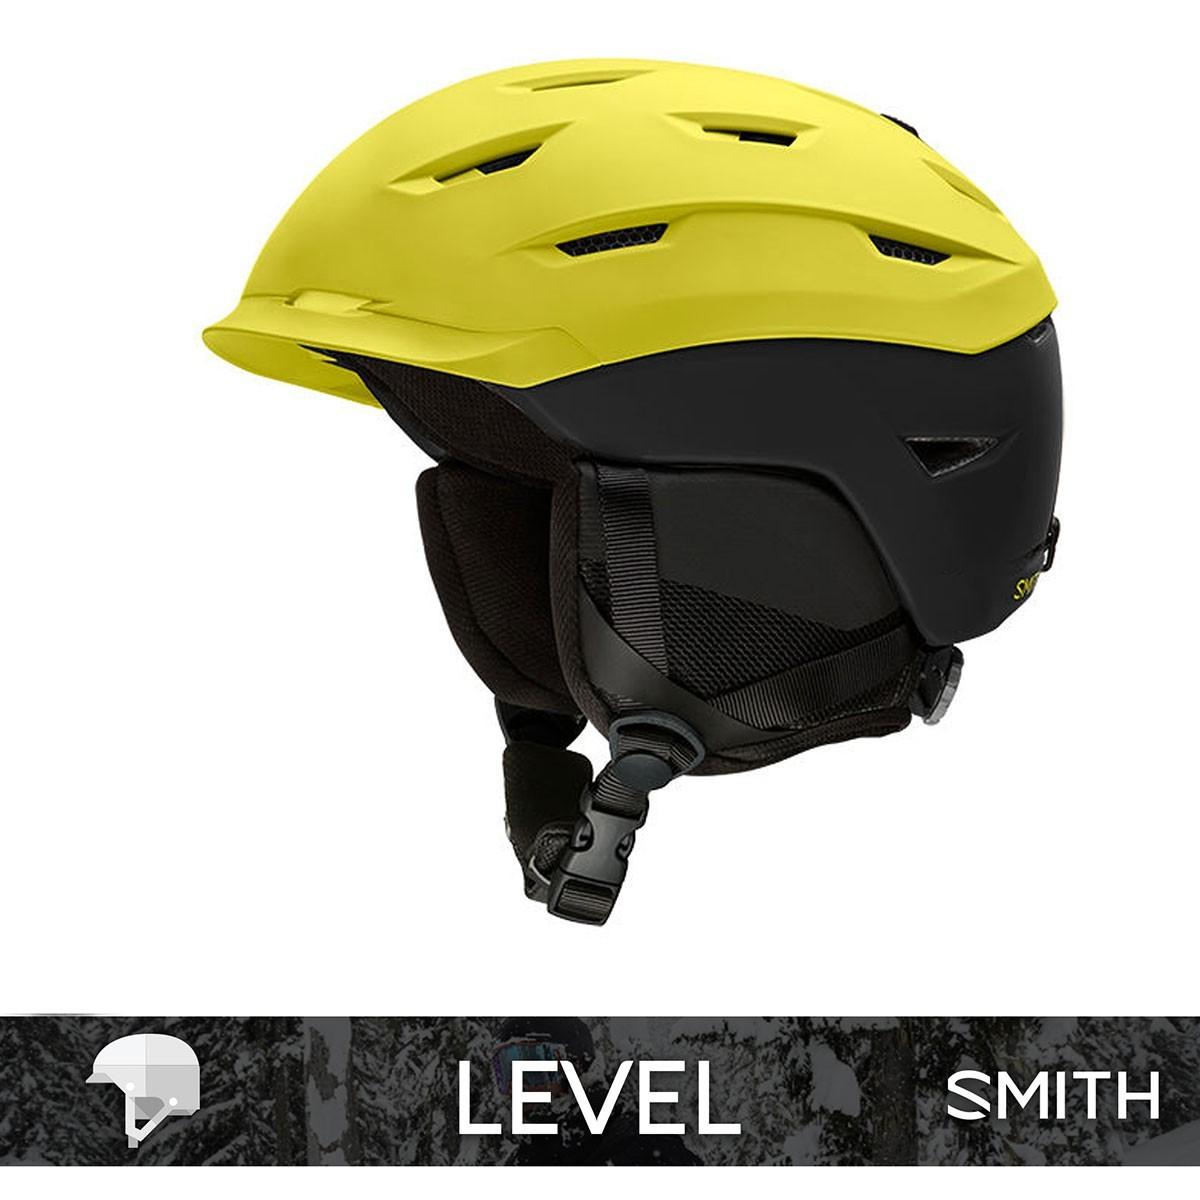 SMITH LEVEL matte Citron Black - Изображение - AQUAMATRIX